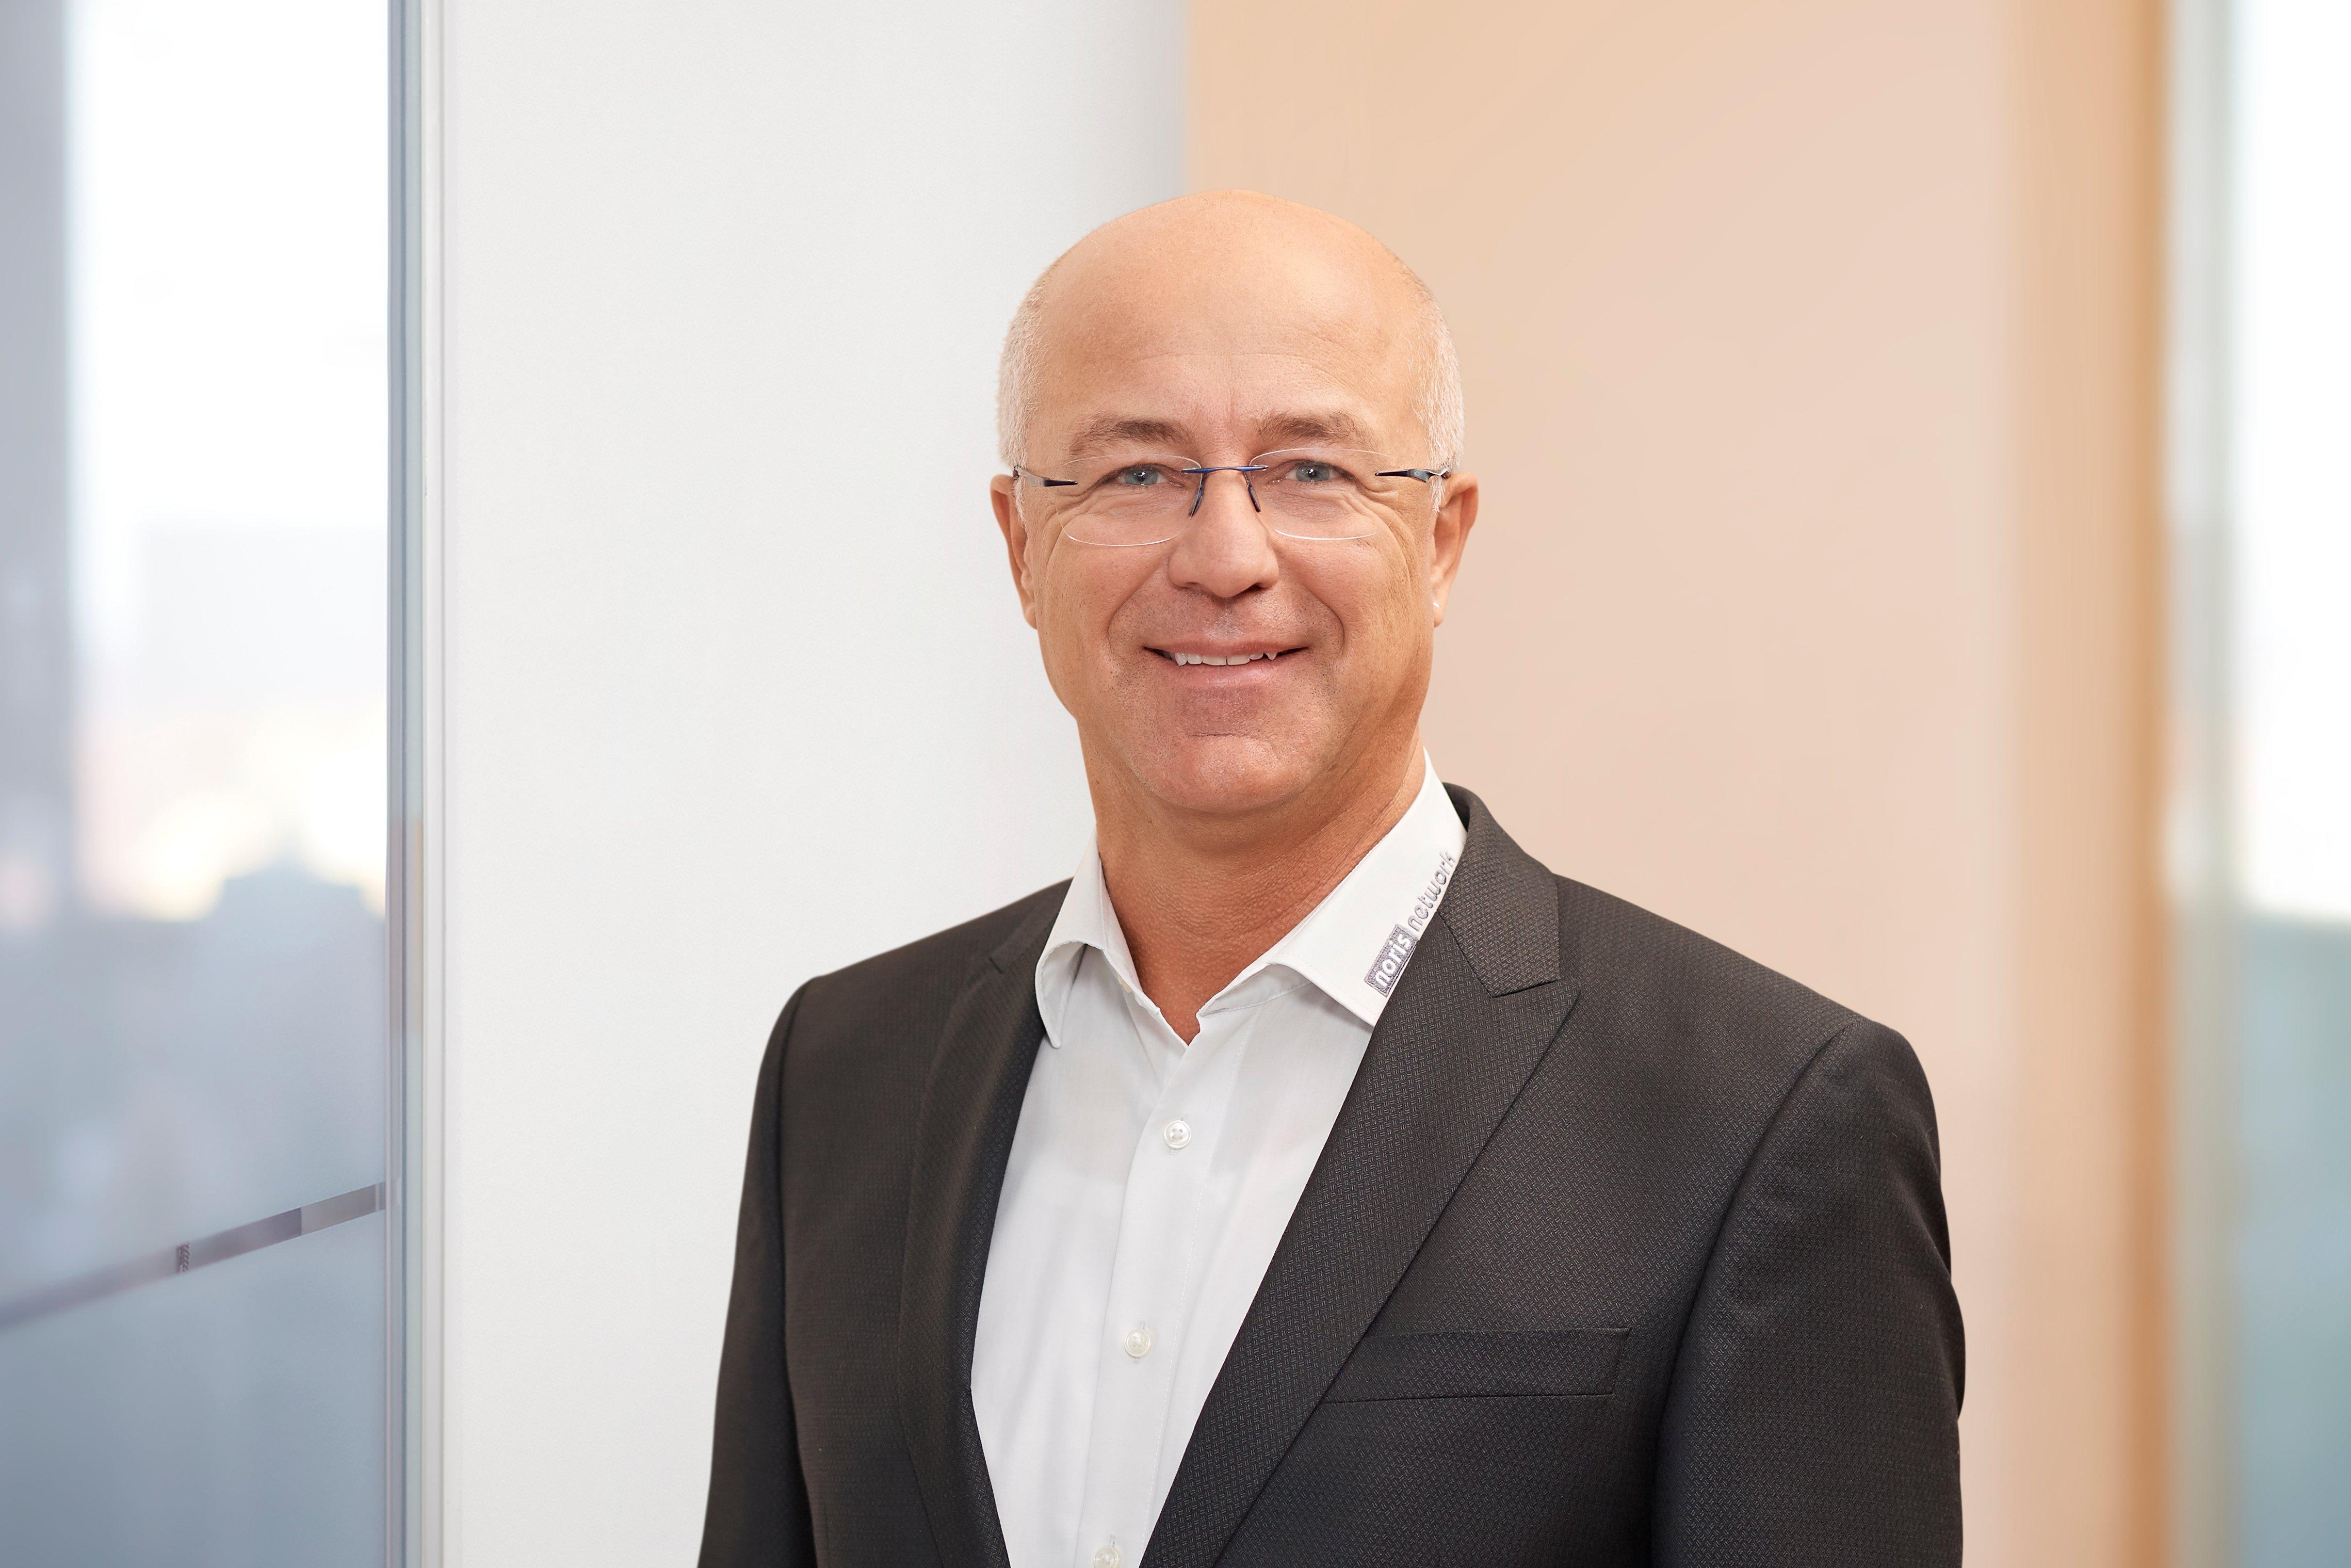 Michael Stapfer, Key Account Manager noris network